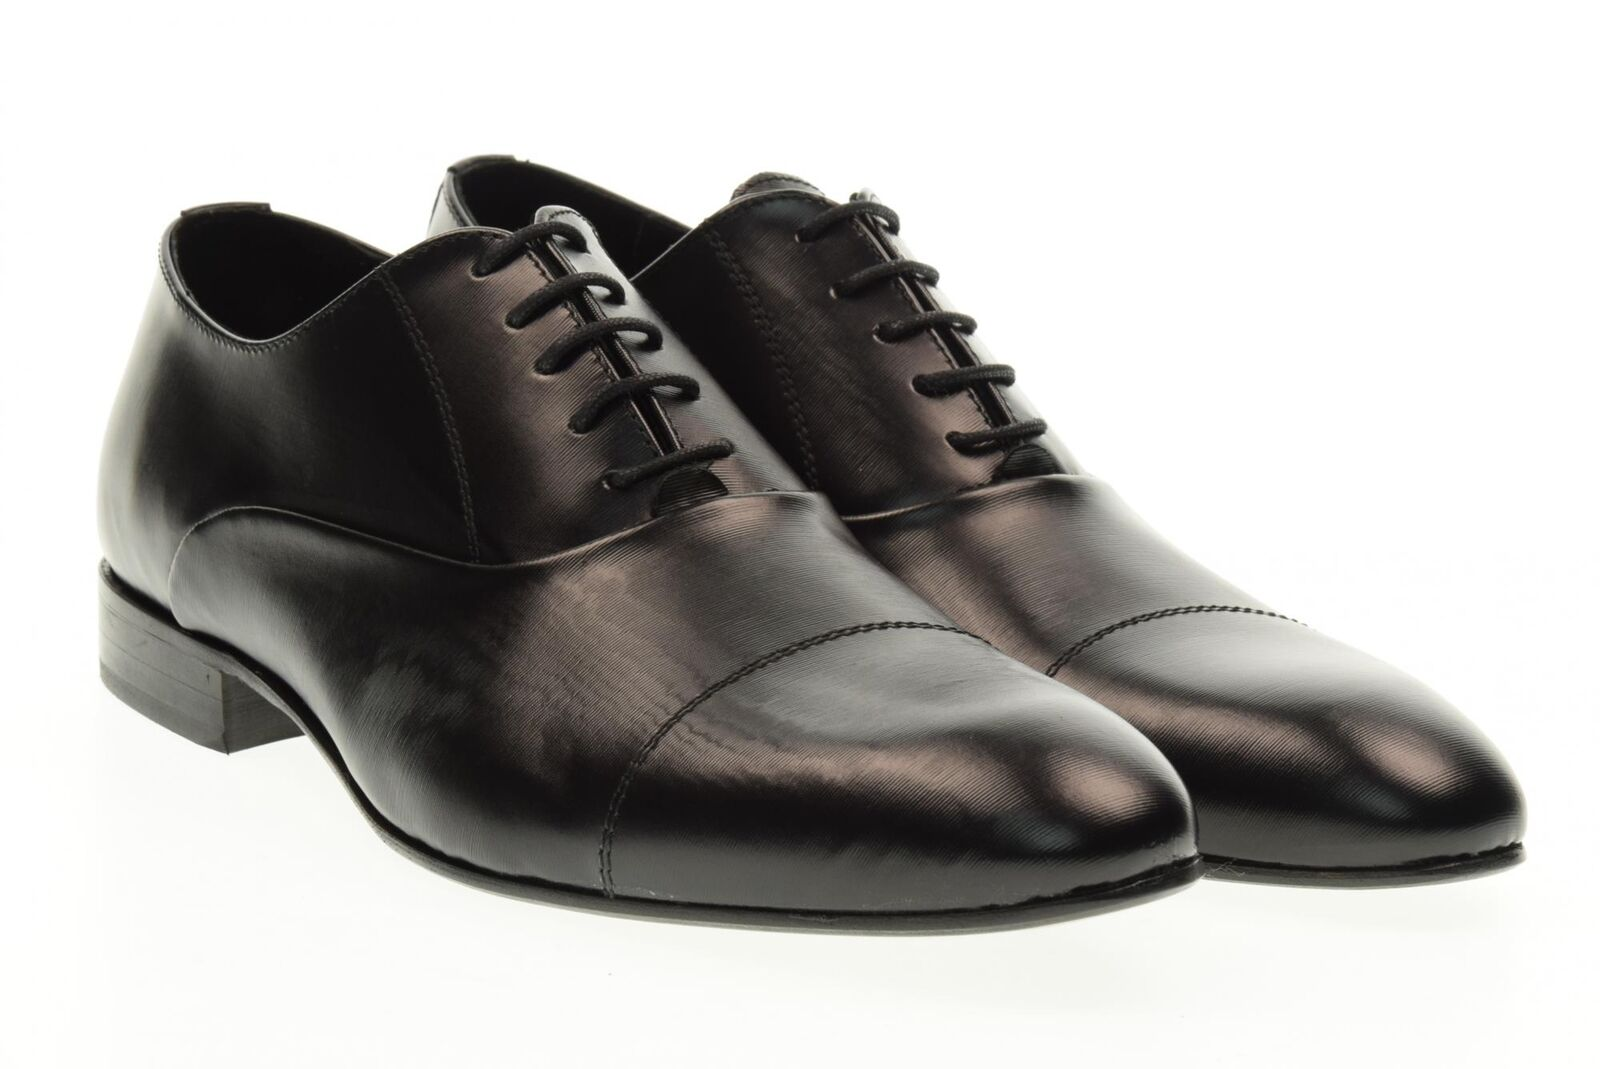 Eveet P17f zapatos homme dentelle 16514